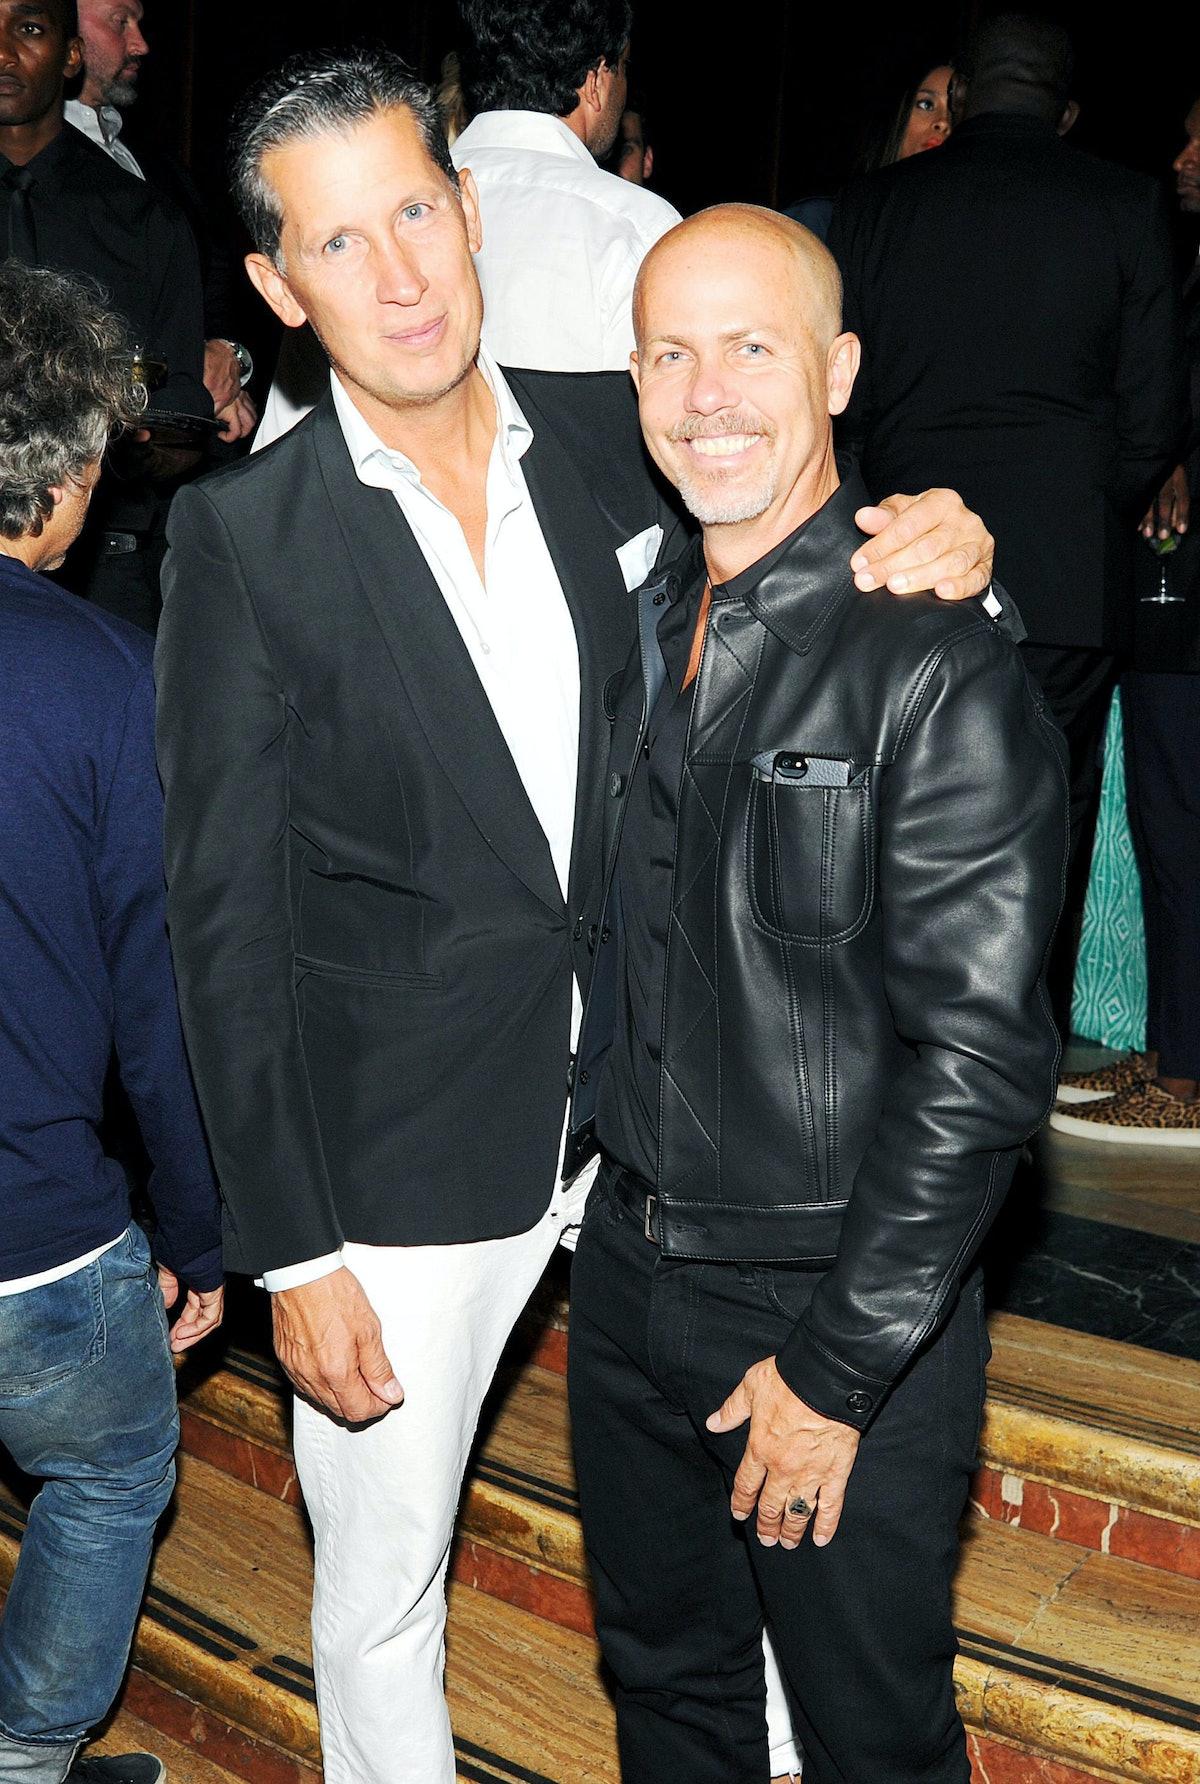 Stefano Tonchi and Italo Zucchelli